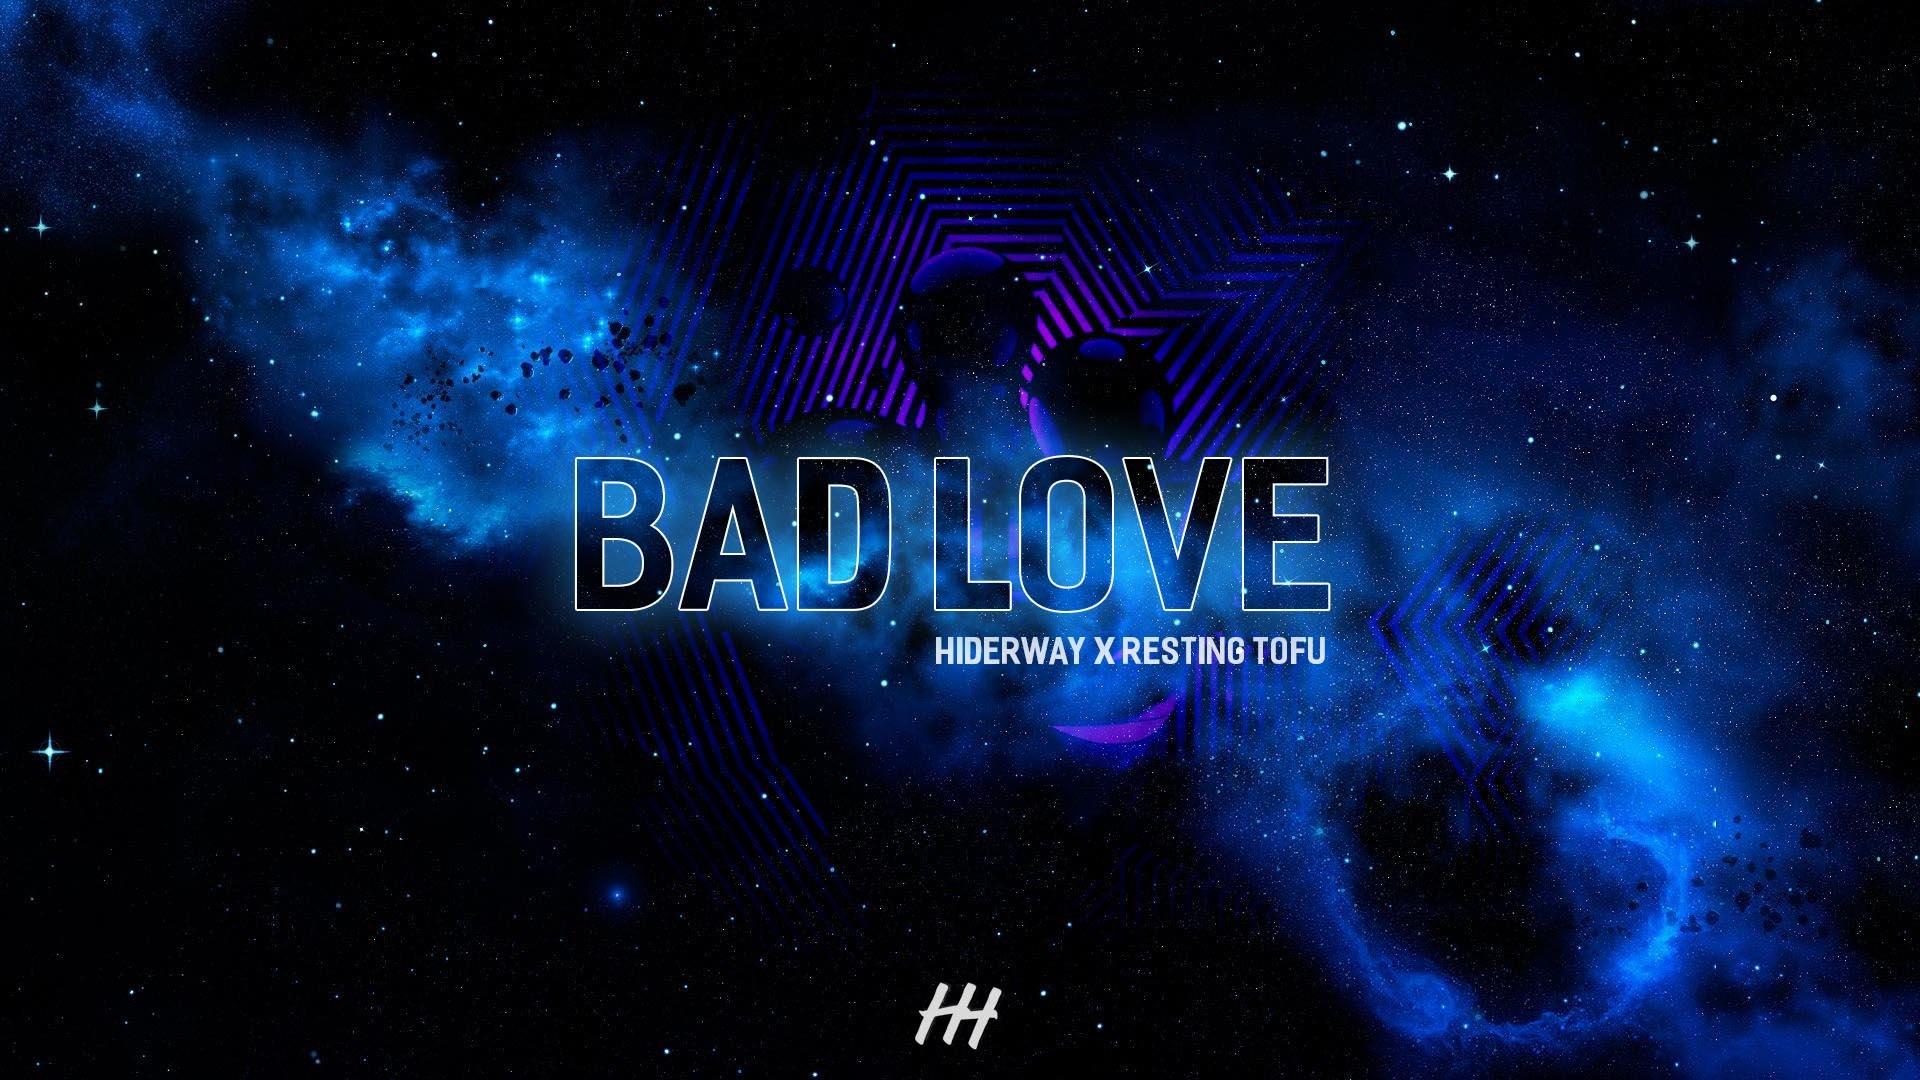 Bad Love - Hiderway, Resting Tofu